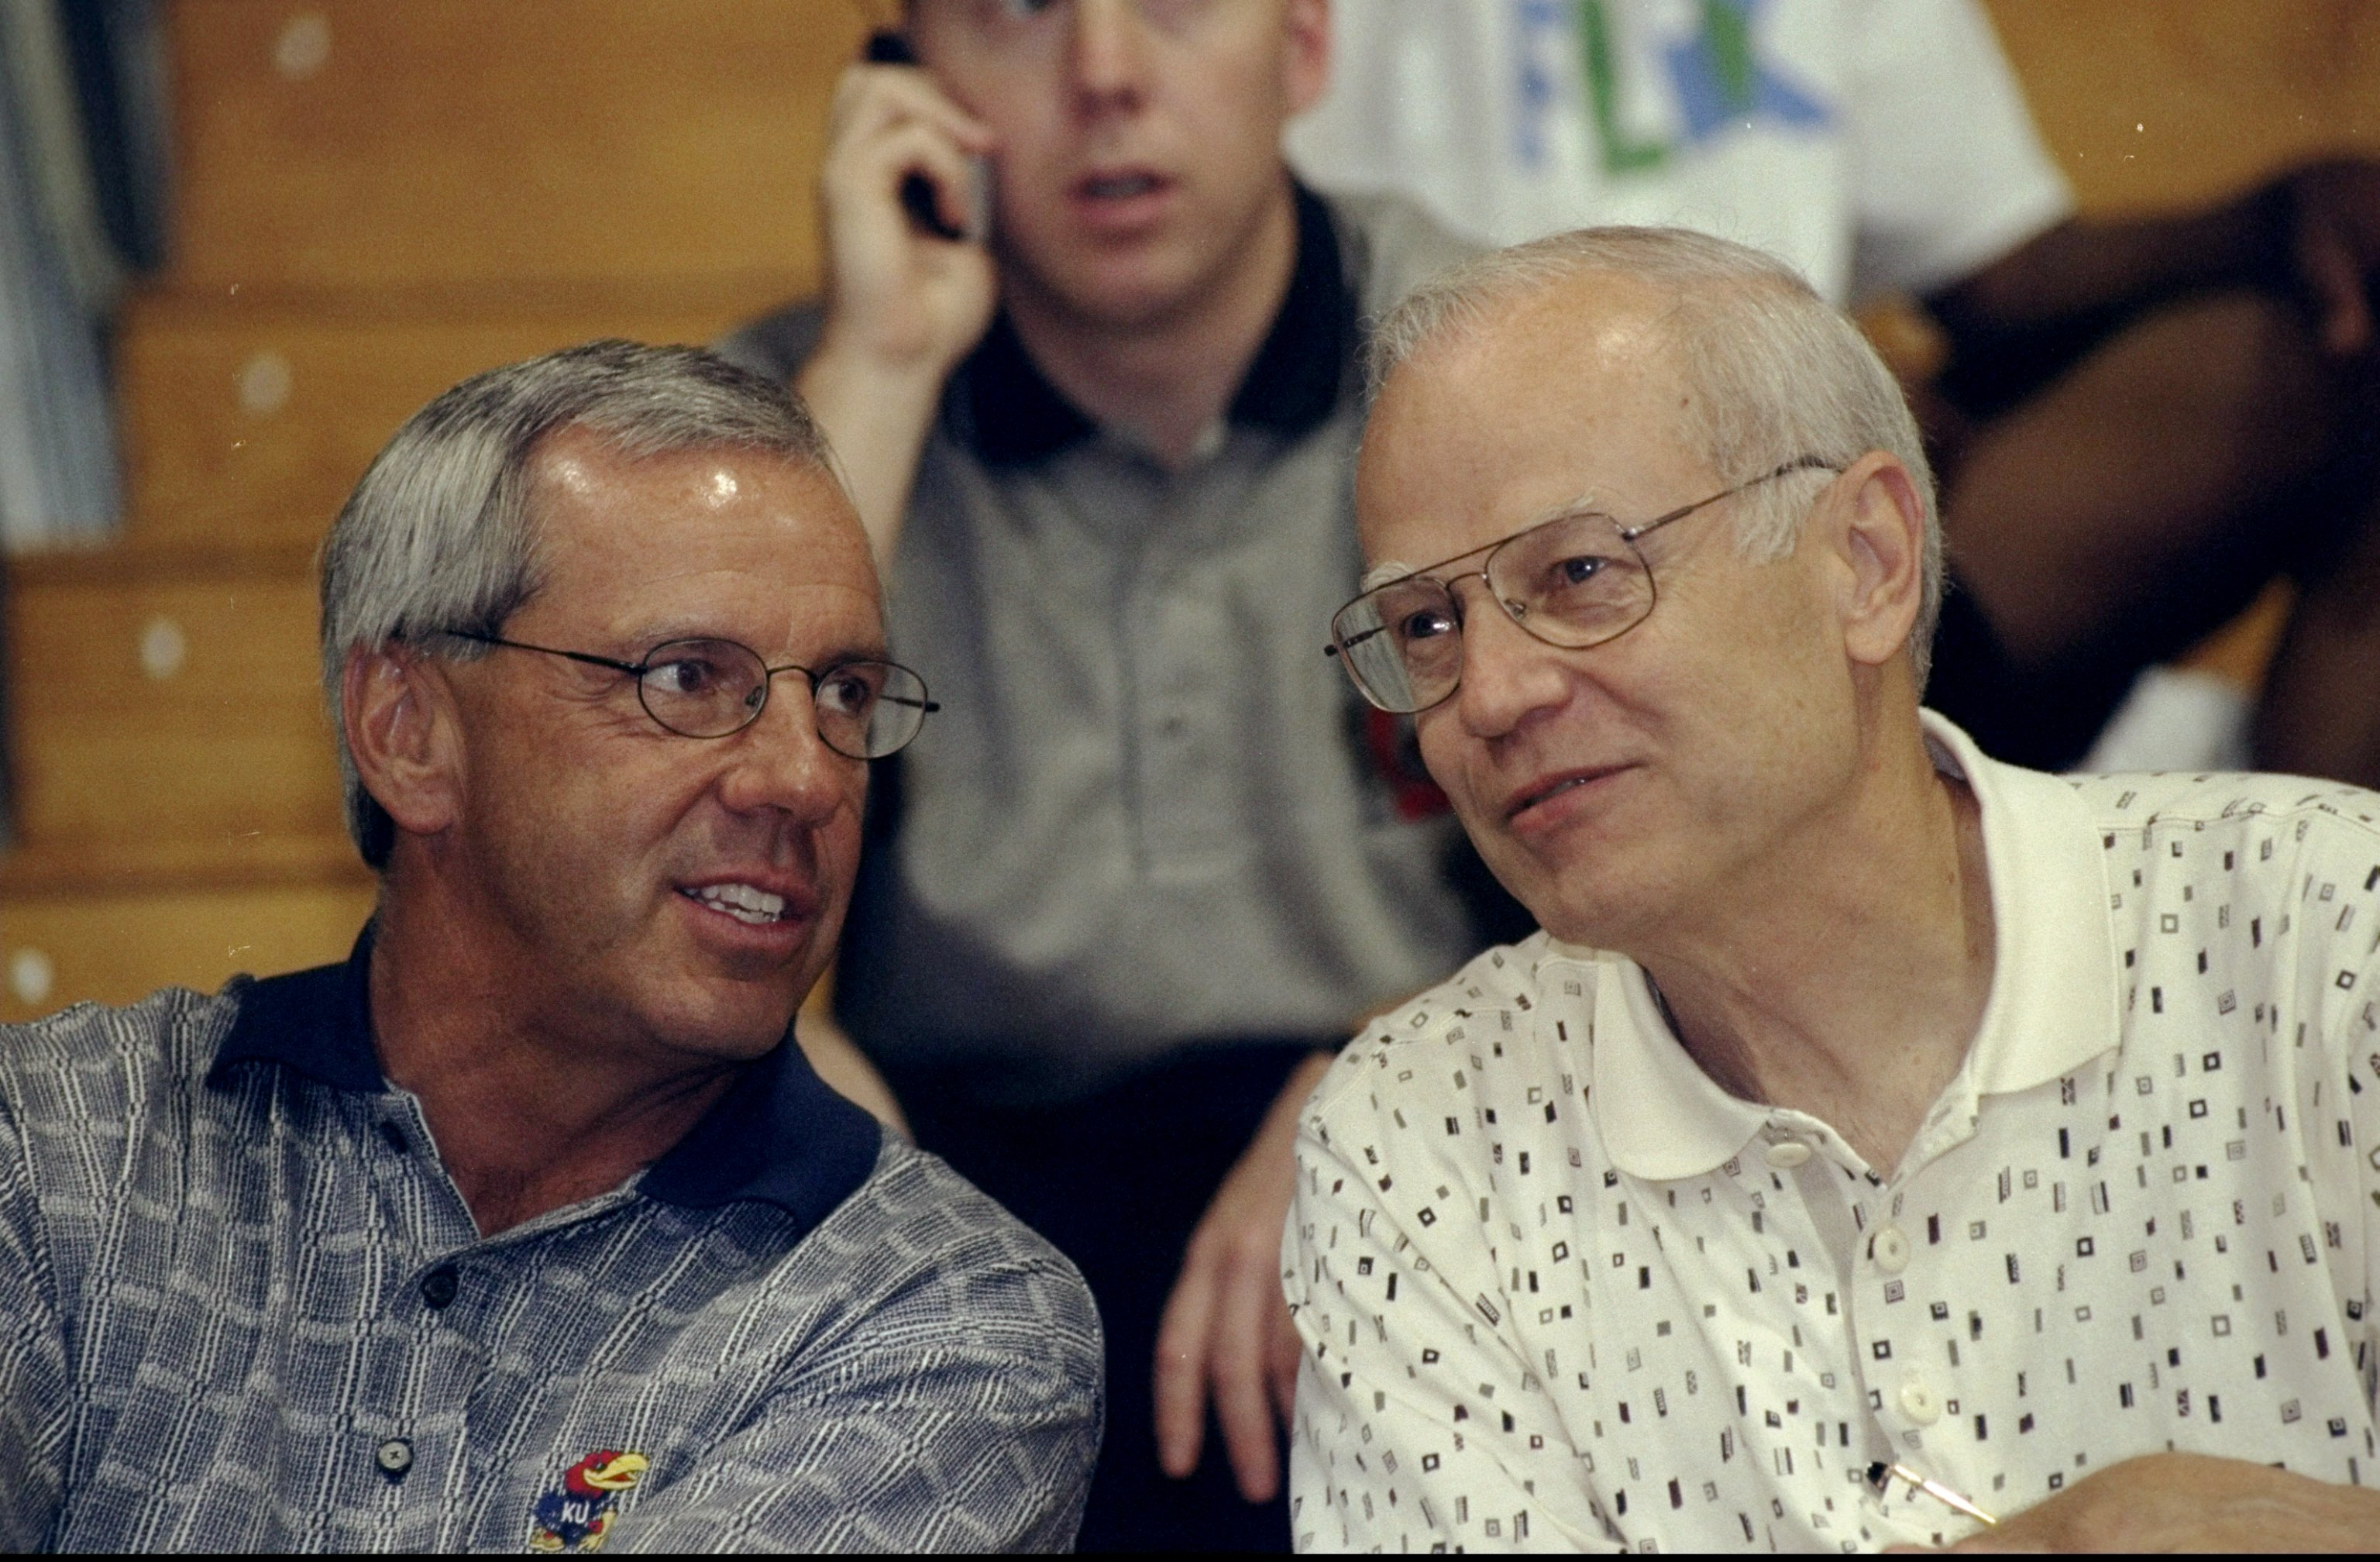 Roy Williams & Bill Guthridge